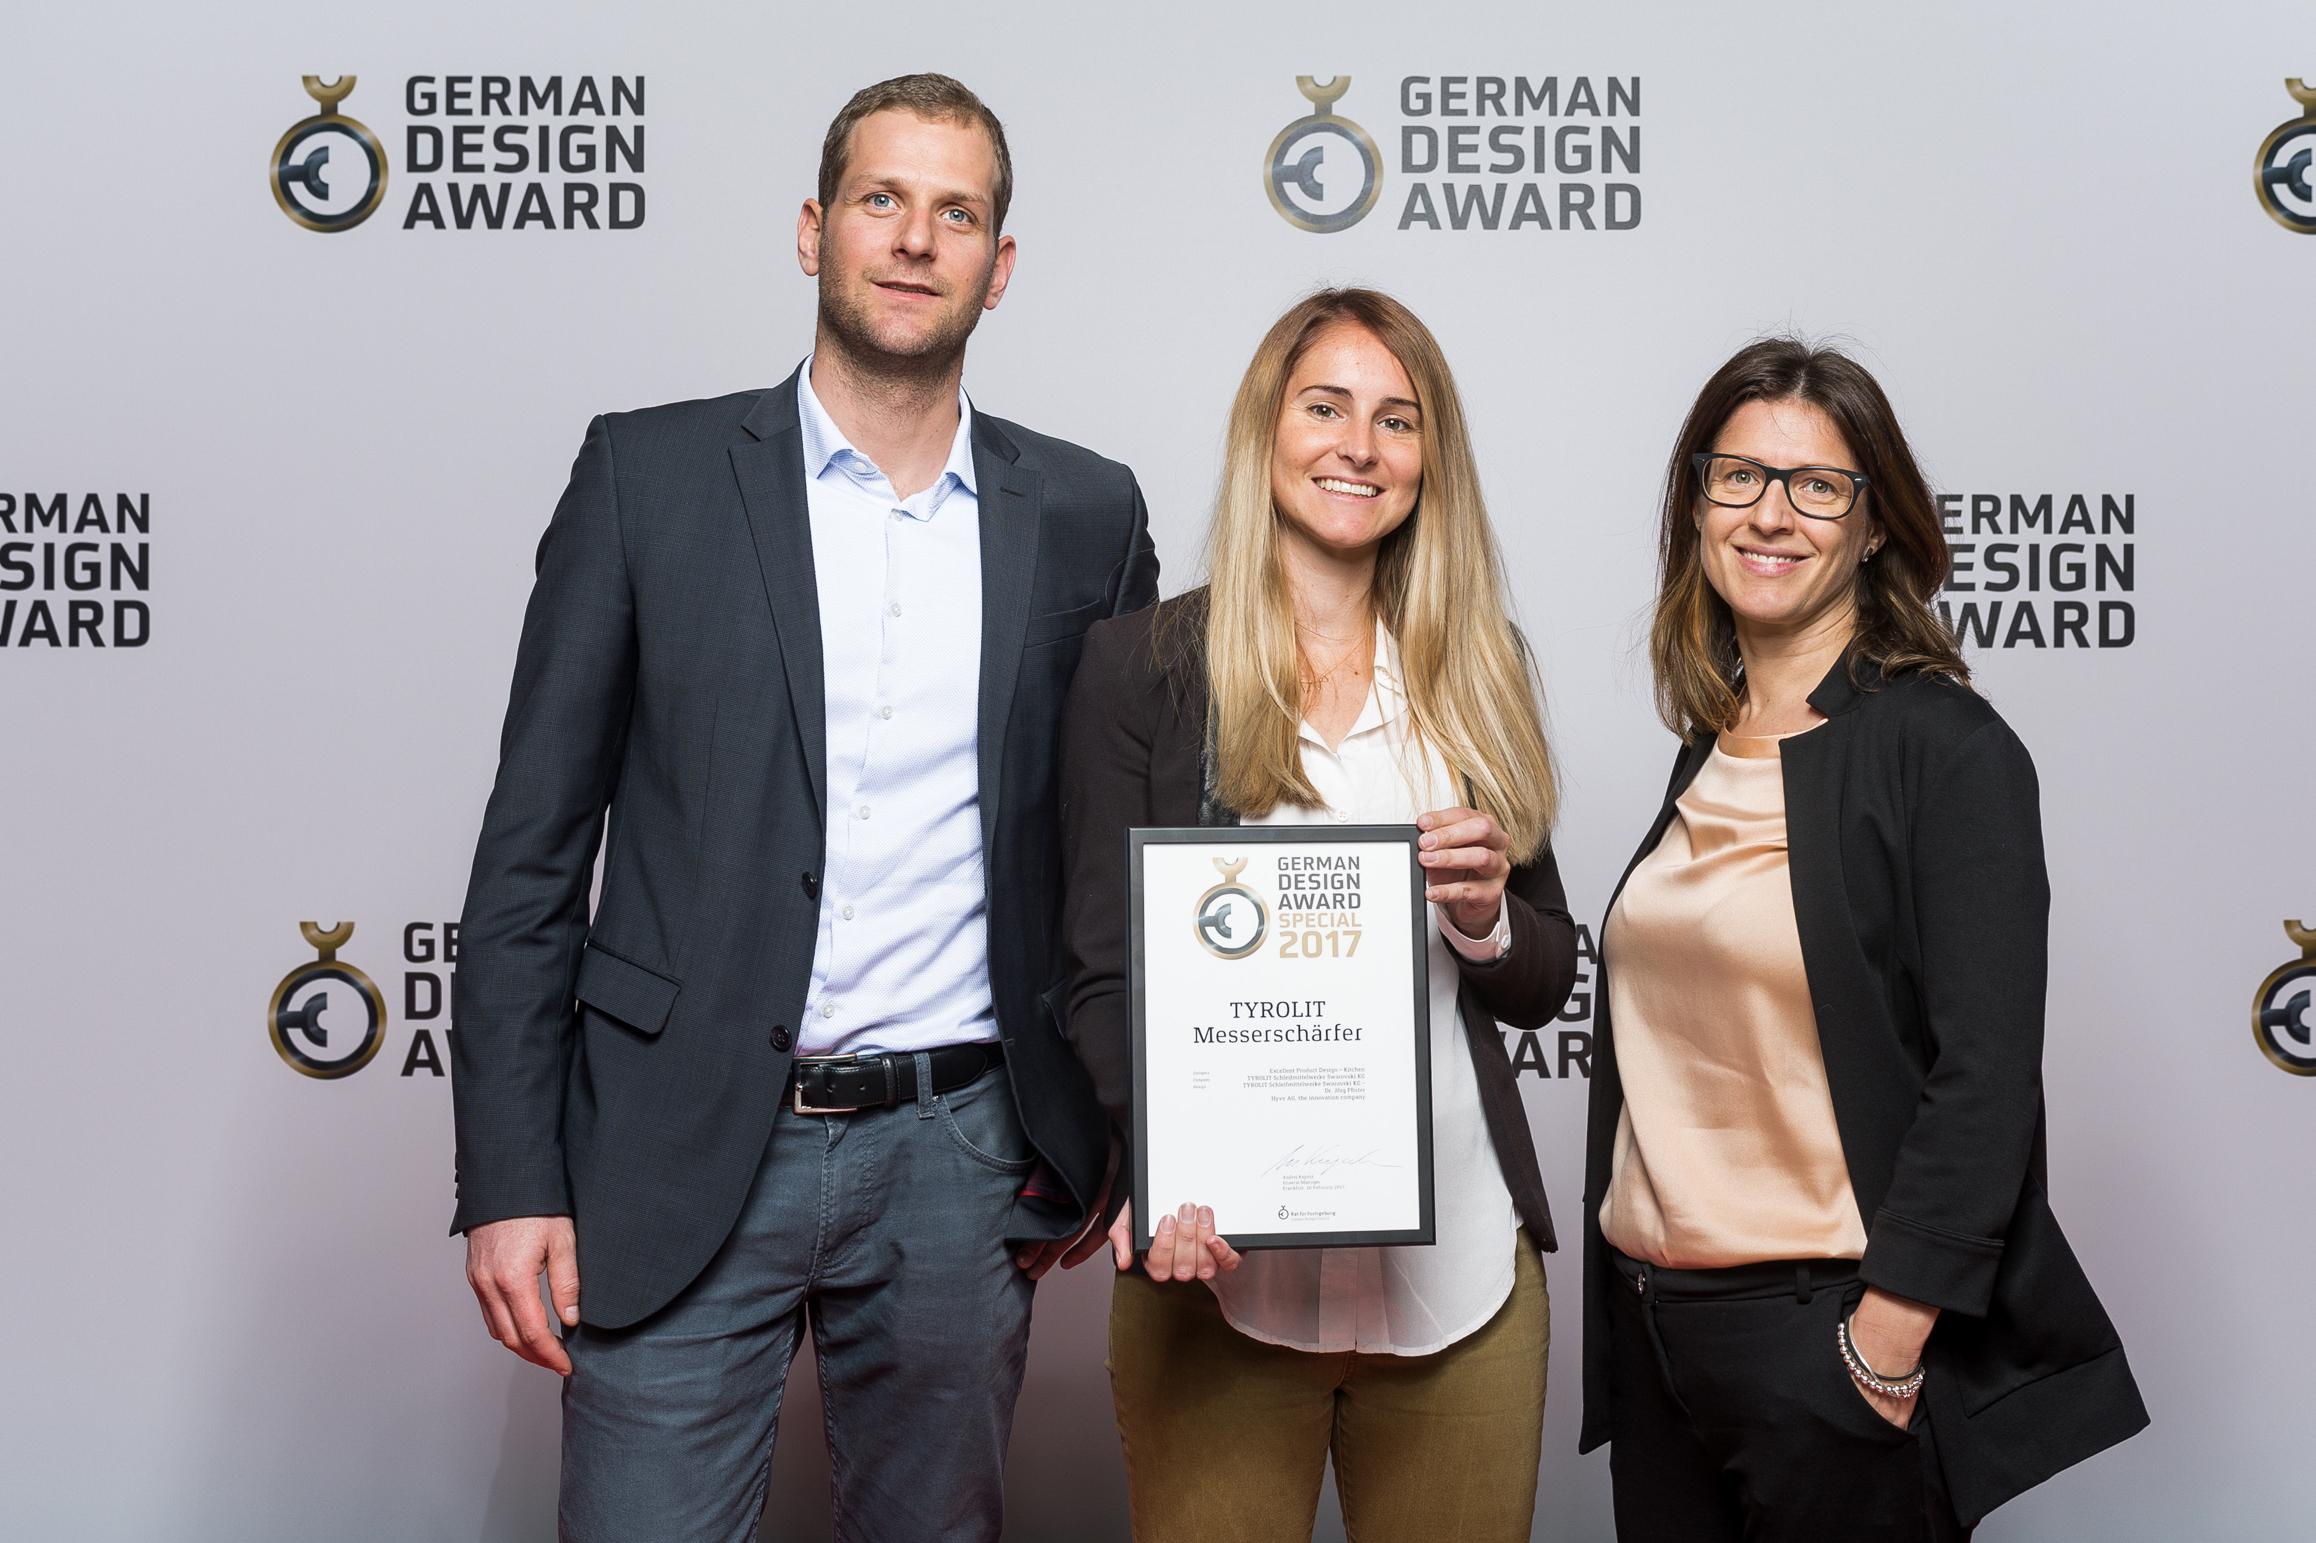 TYROLIT life German Design Award